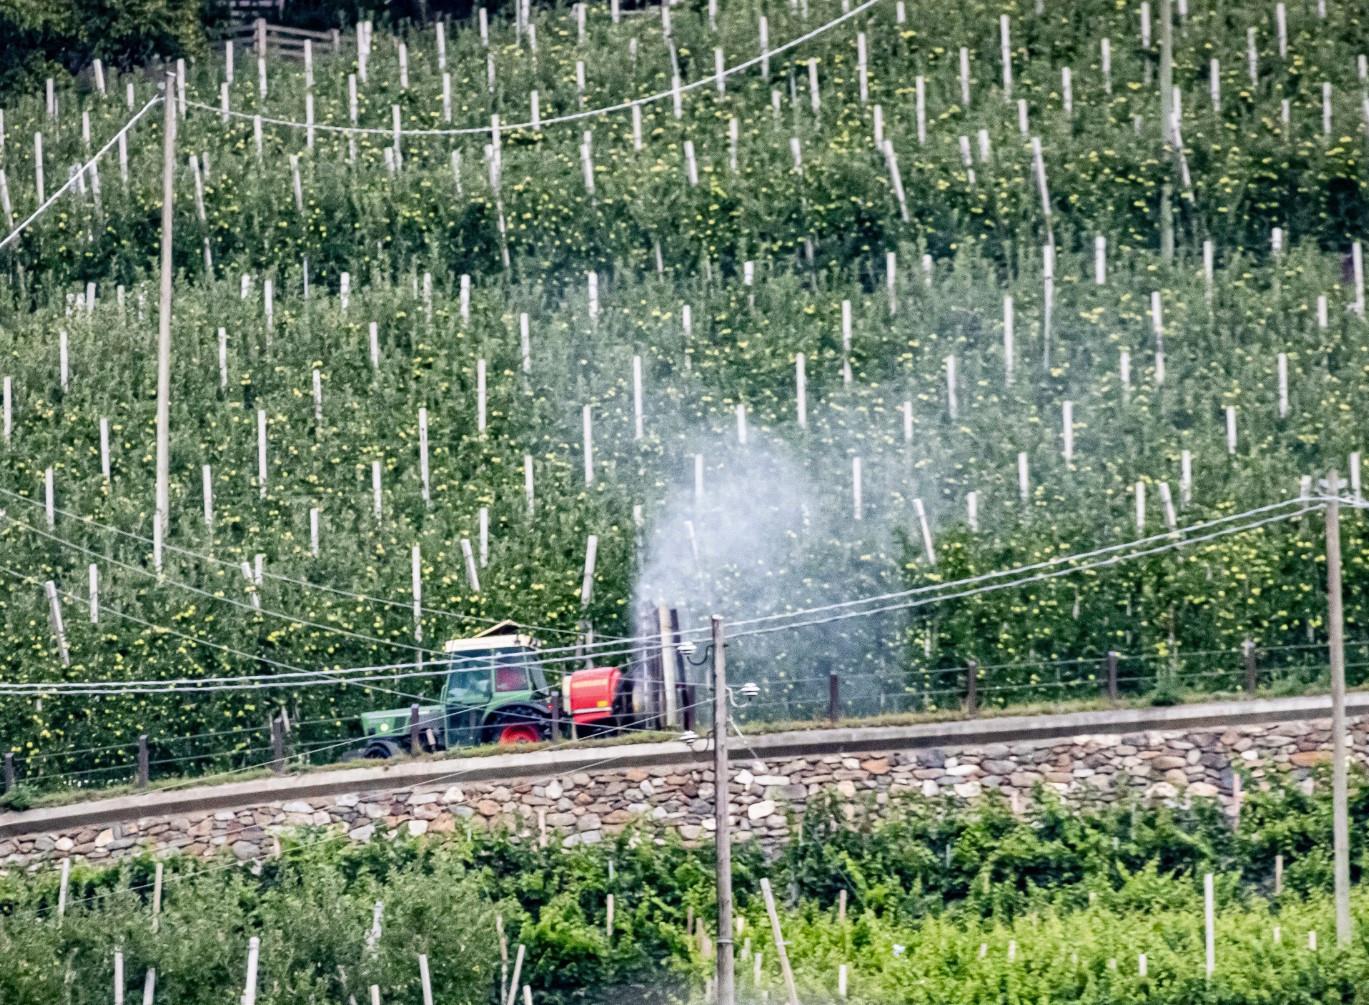 14_traktor_im_vinschgau_jorg_farys.jpg